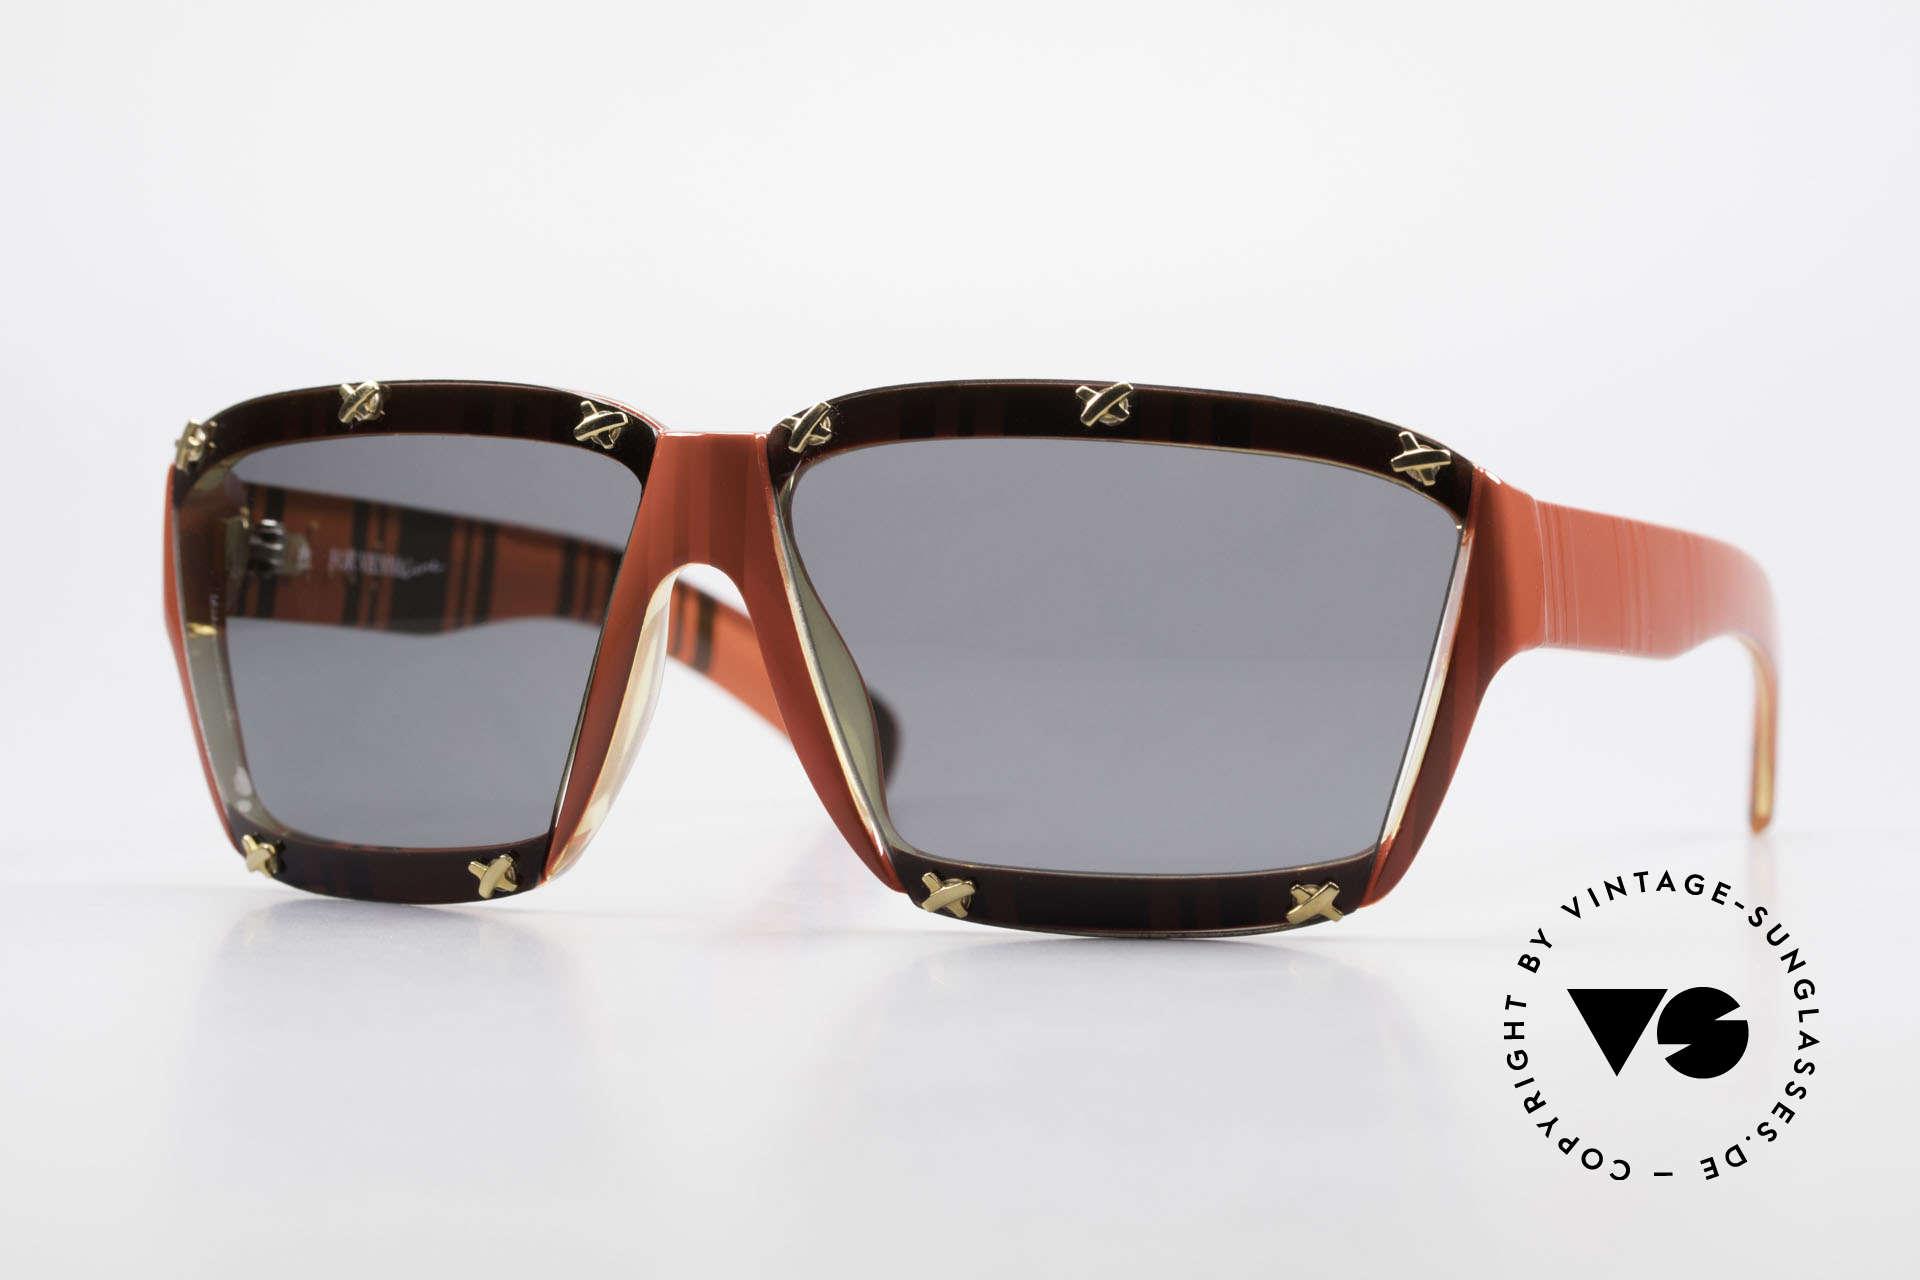 Paloma Picasso 3702 No Retro Sunglasses Ladies, vintage ladies sunglasses by P. PICASSO from 1990, Made for Women